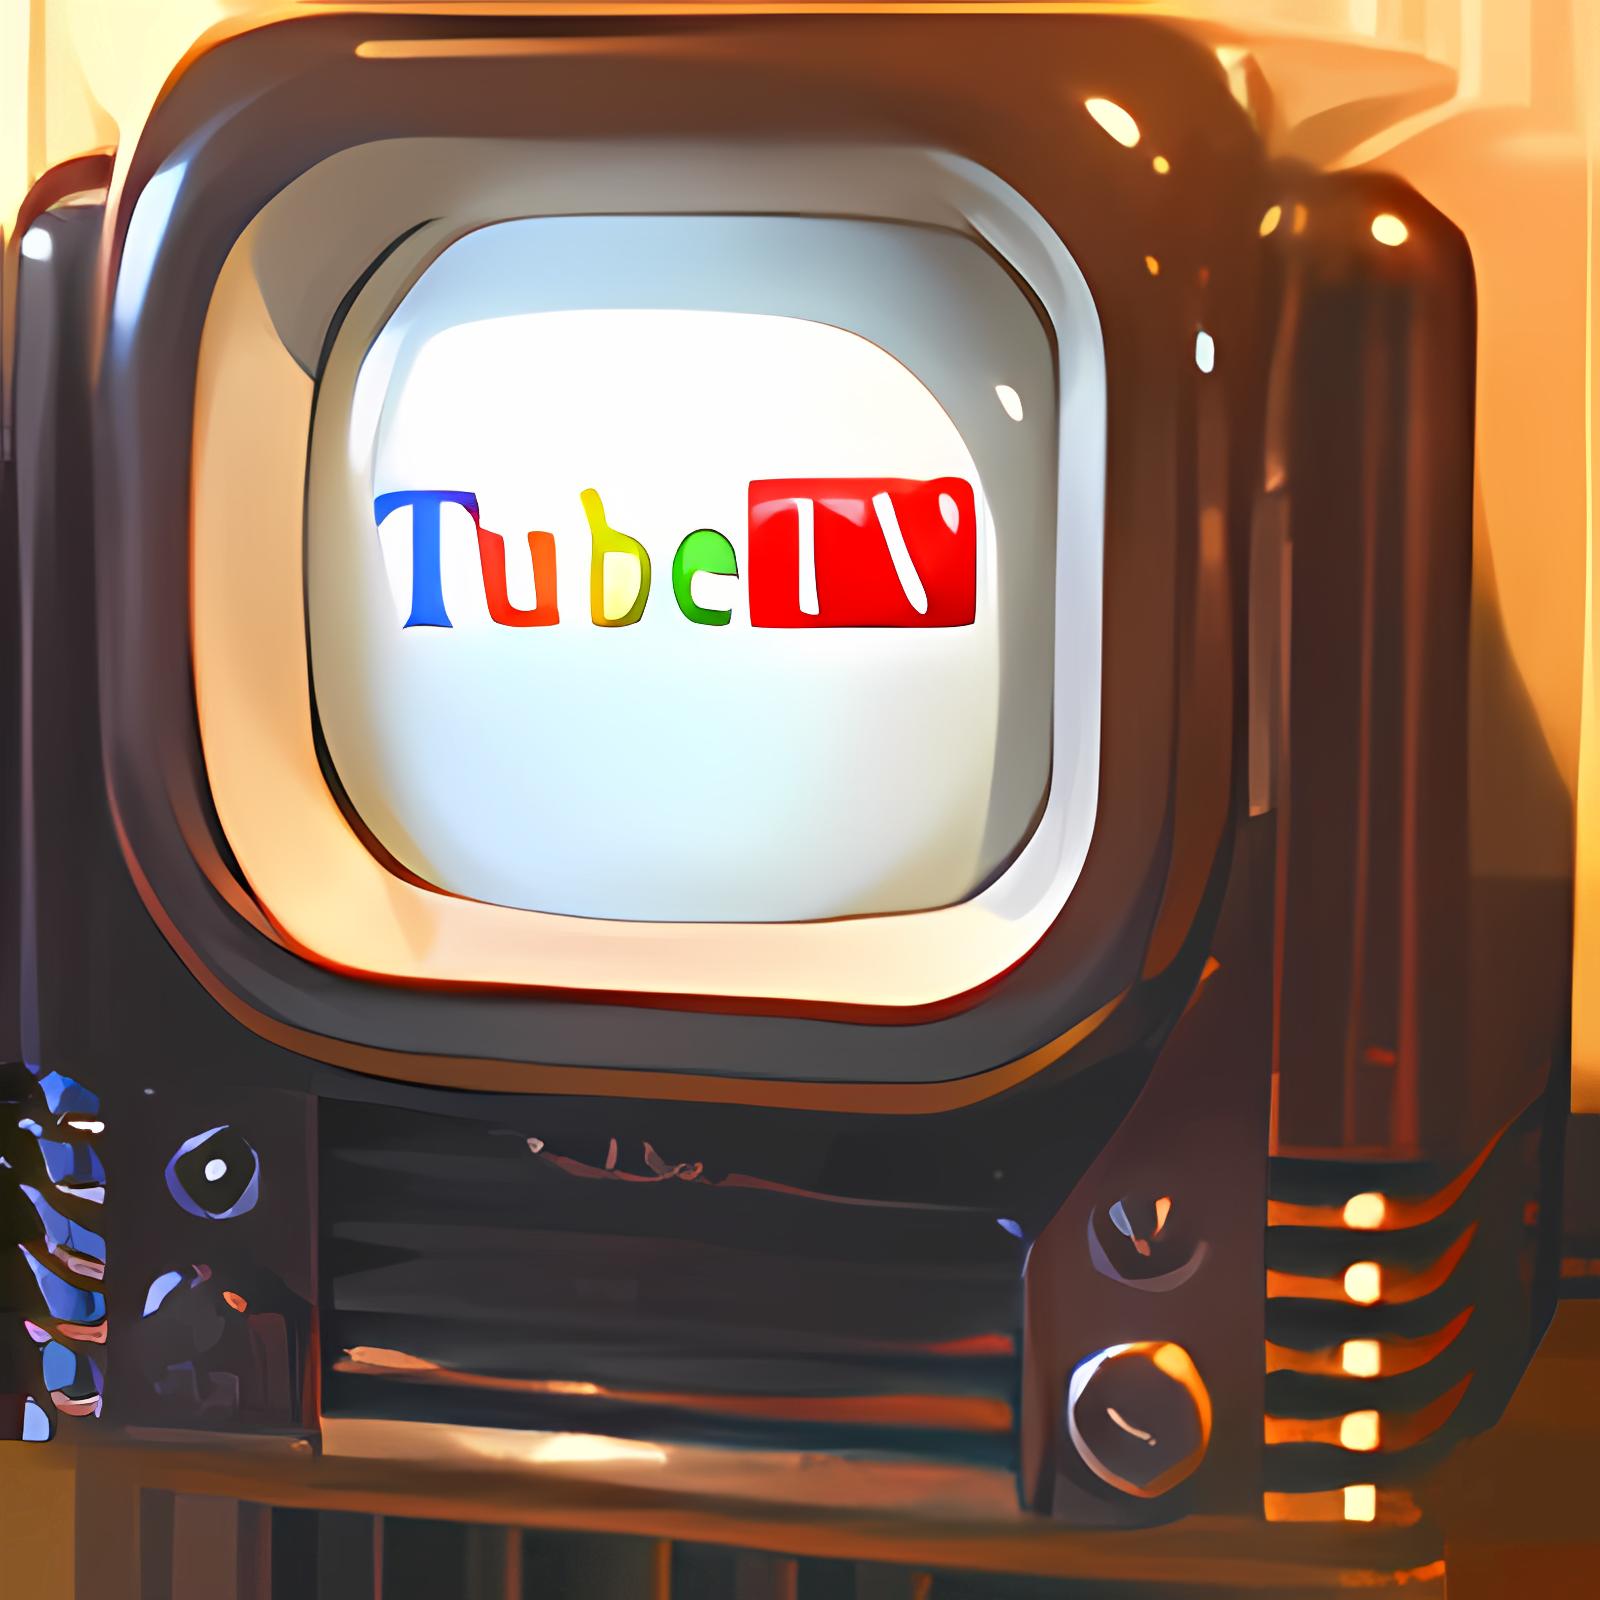 TubeTV 1.0